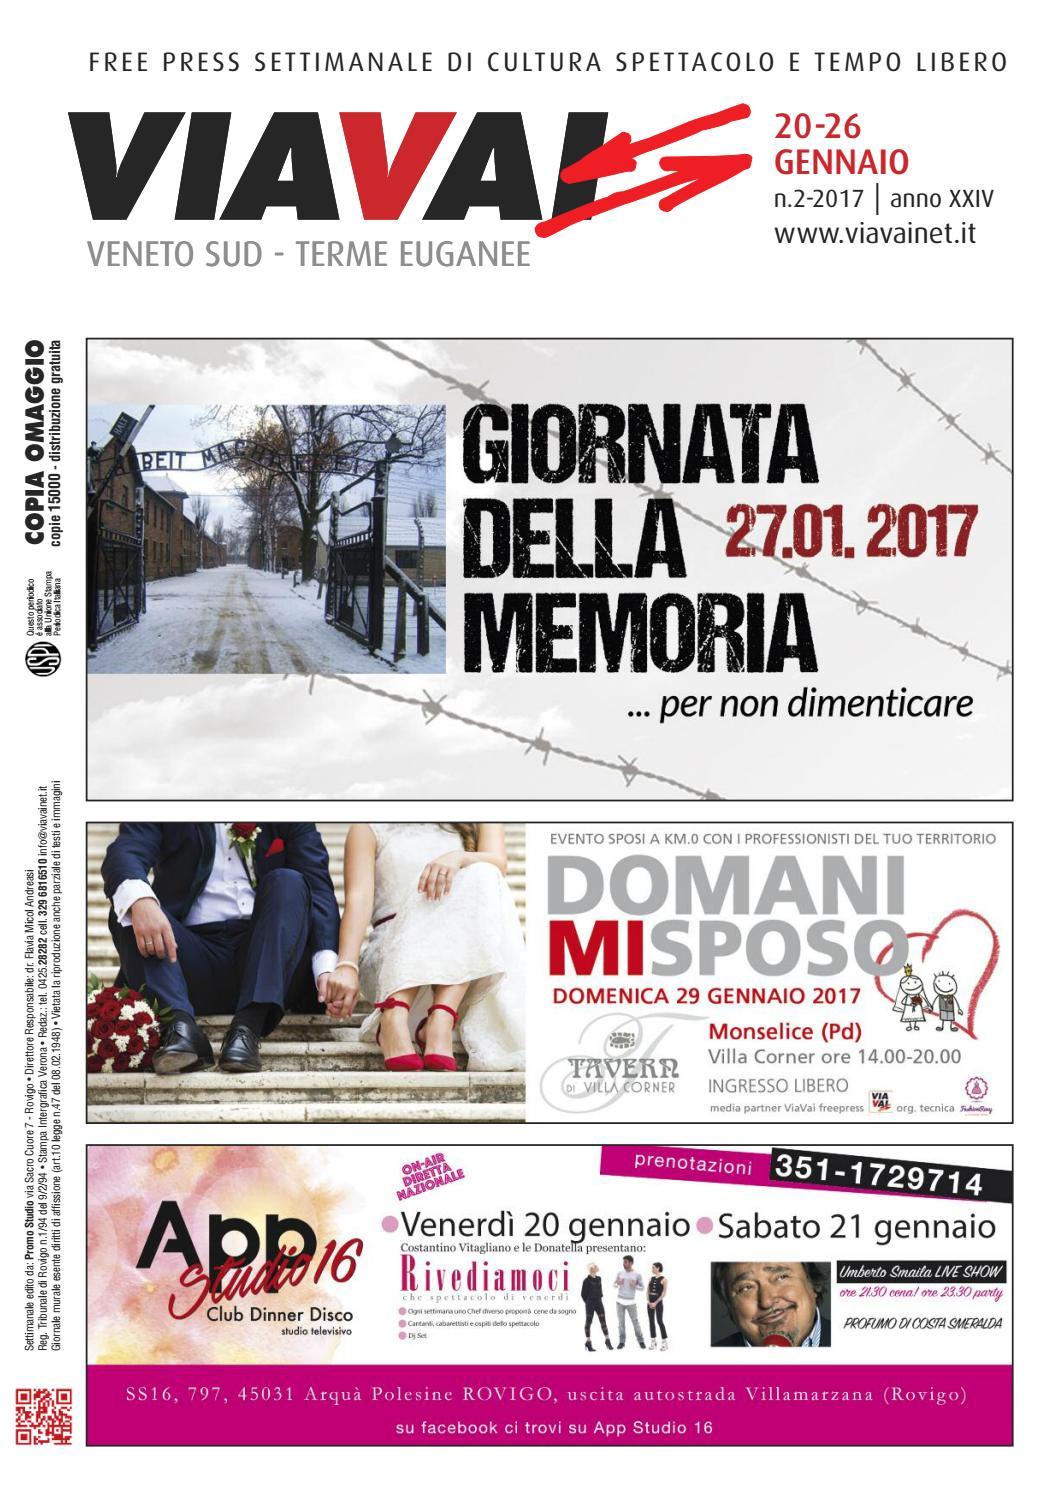 2ee566e3841b viavai 20 gennaio 2017 by Via Vai Veneto Sud - Terme Euganee - issuu